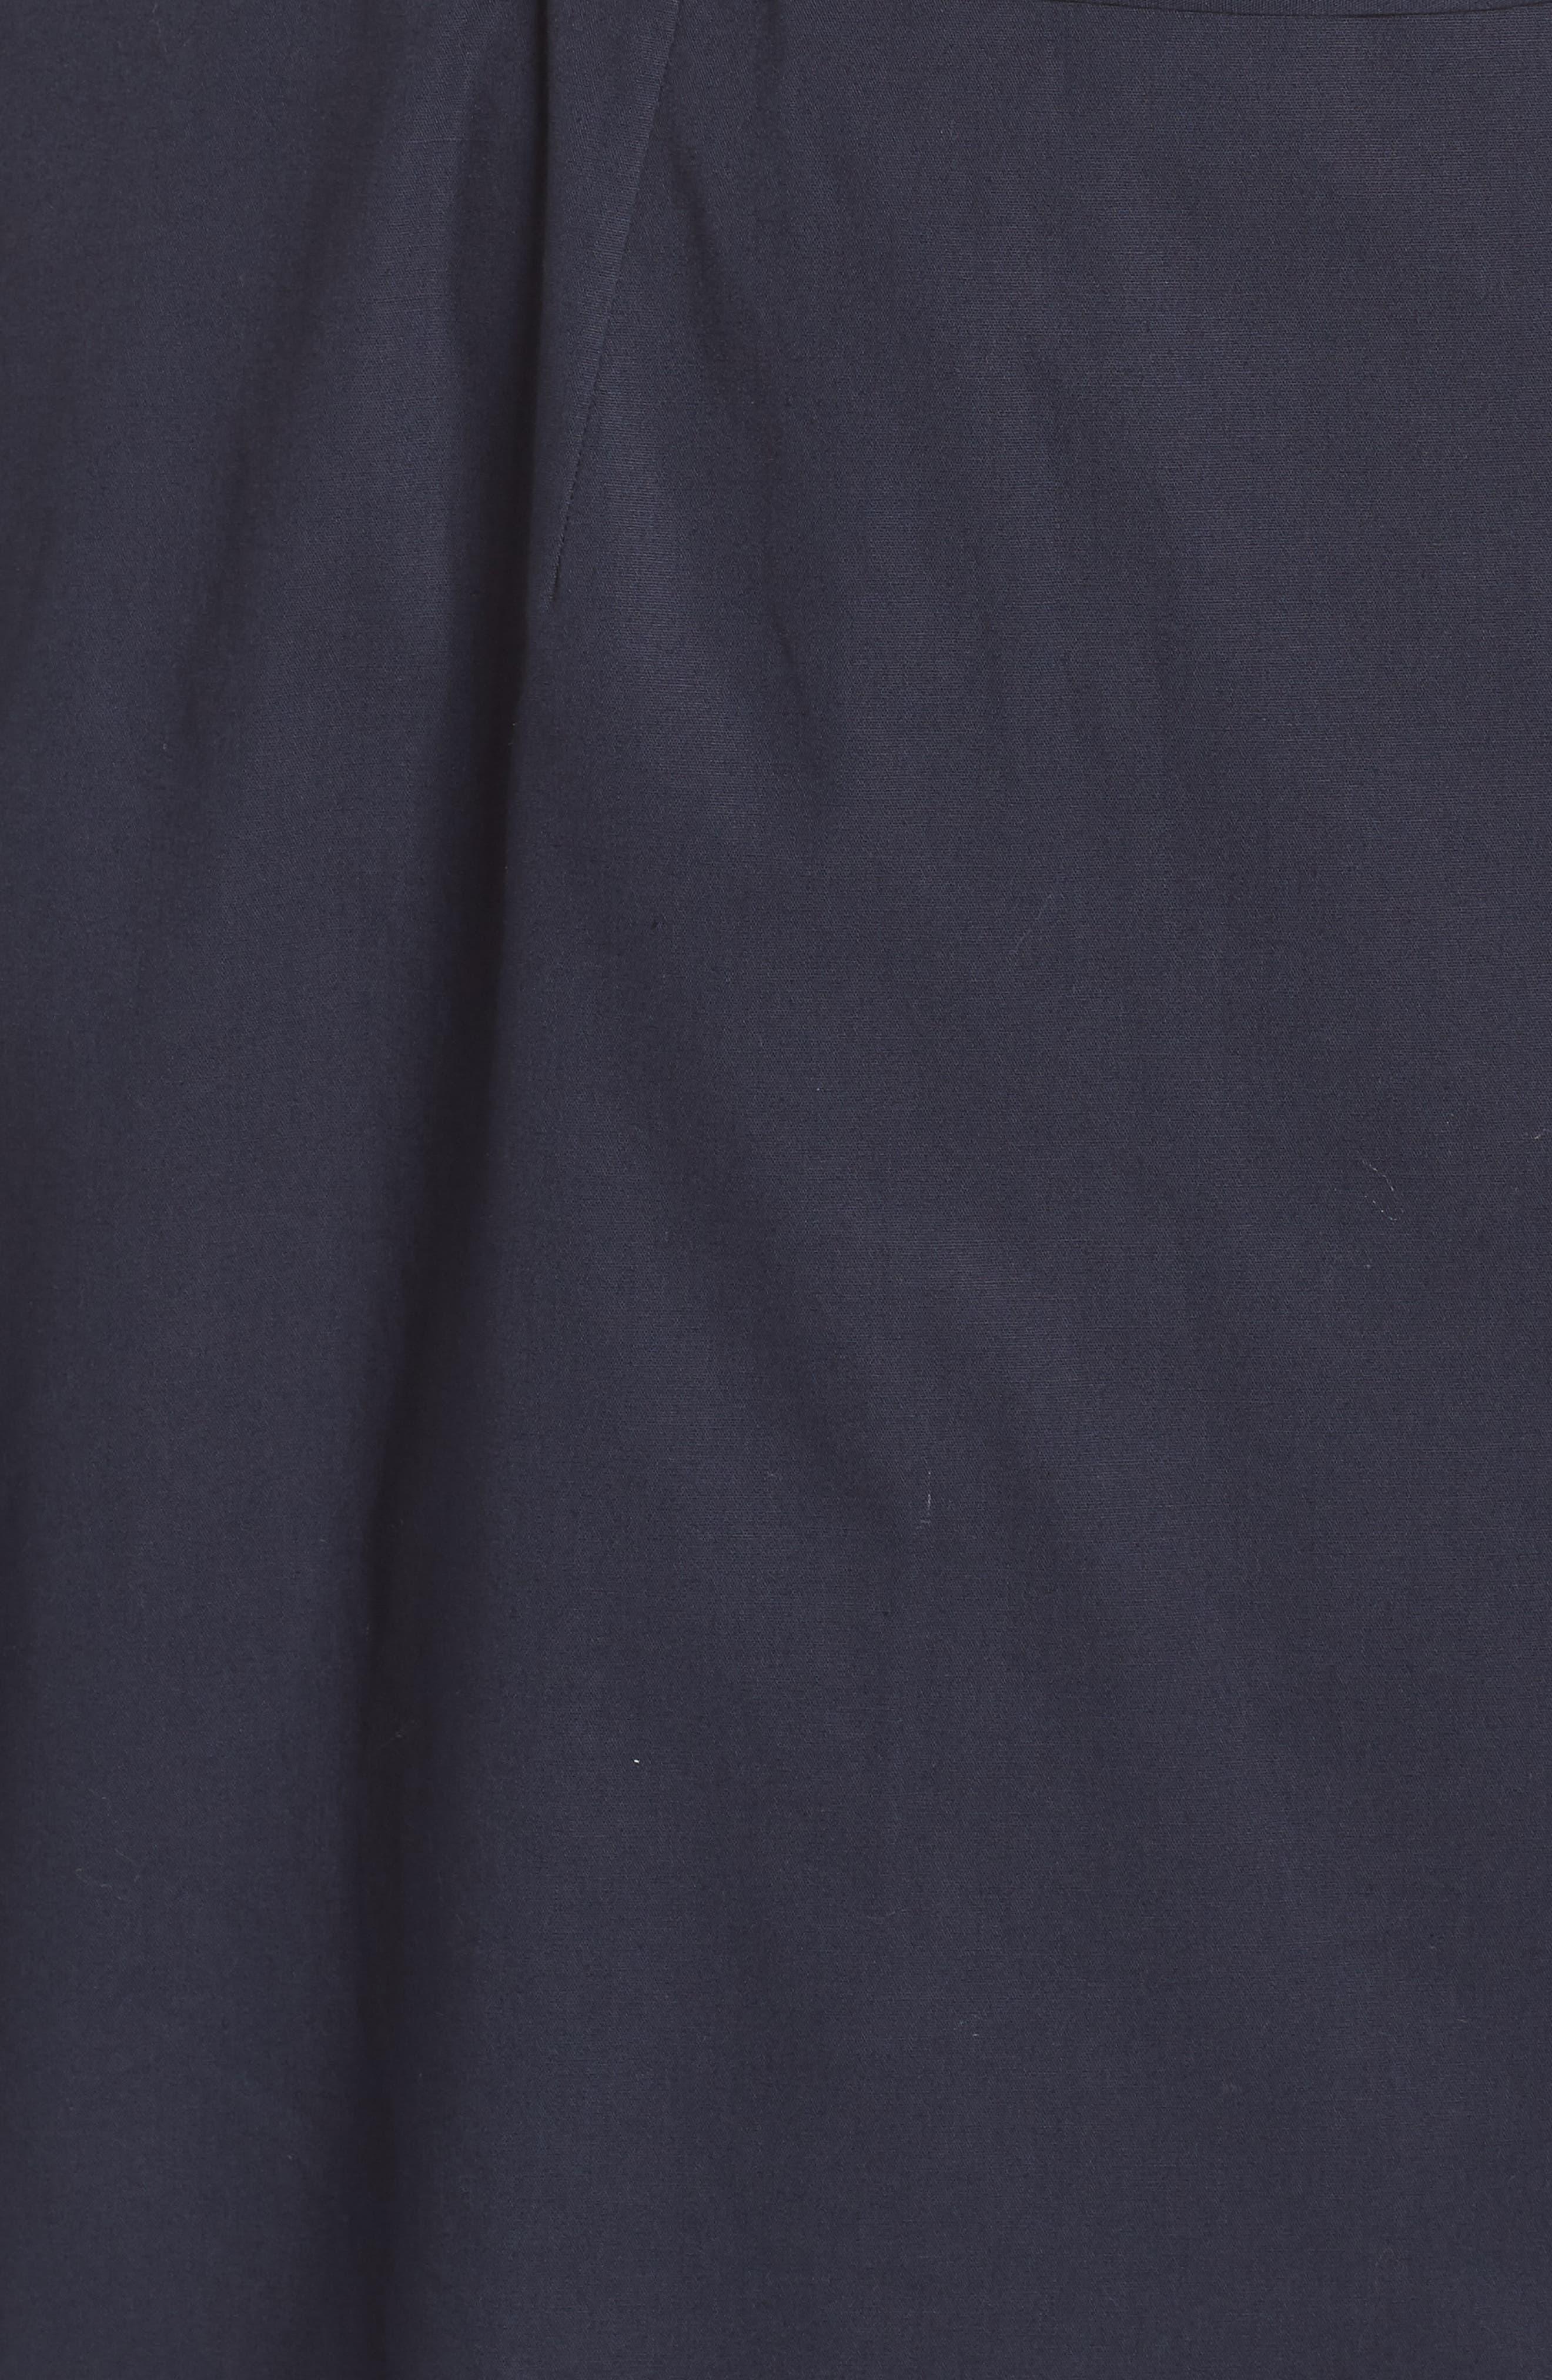 Ruffle Trim Poplin Wrap Dress,                             Alternate thumbnail 6, color,                             NAVY